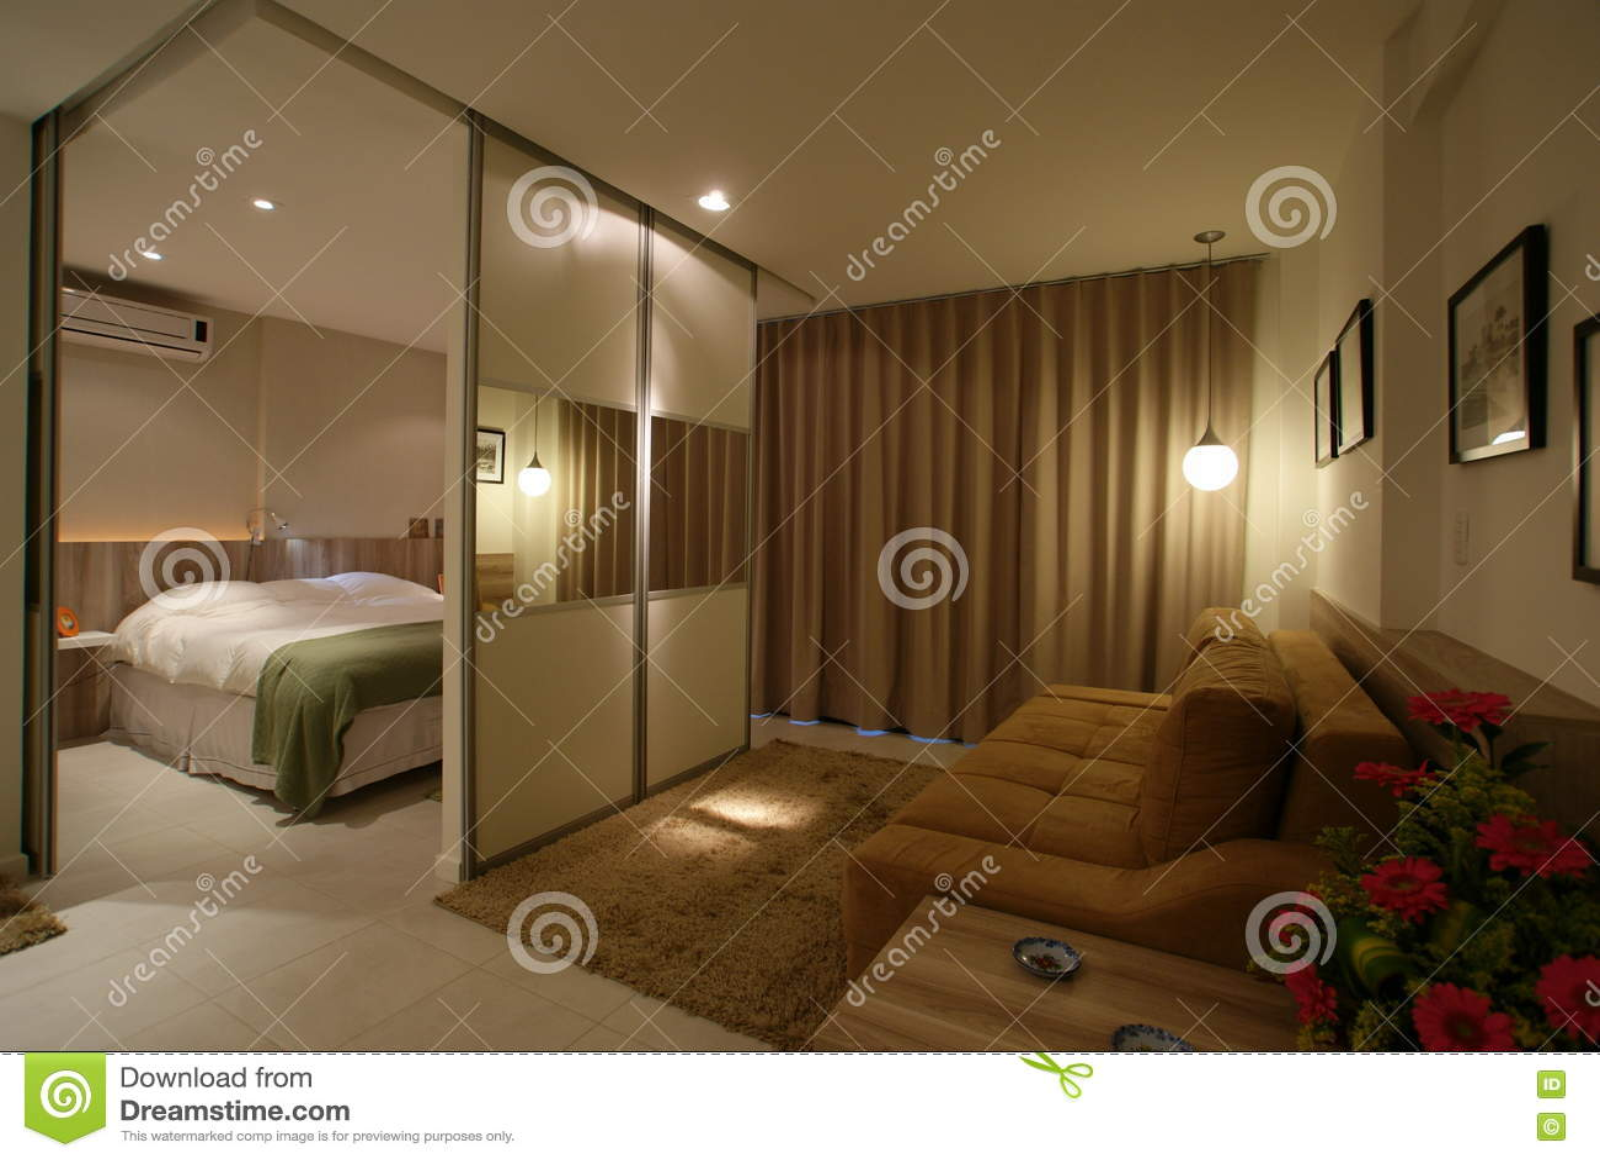 Modern Loft Interior Design With Sliding Doors Stock Photo Image